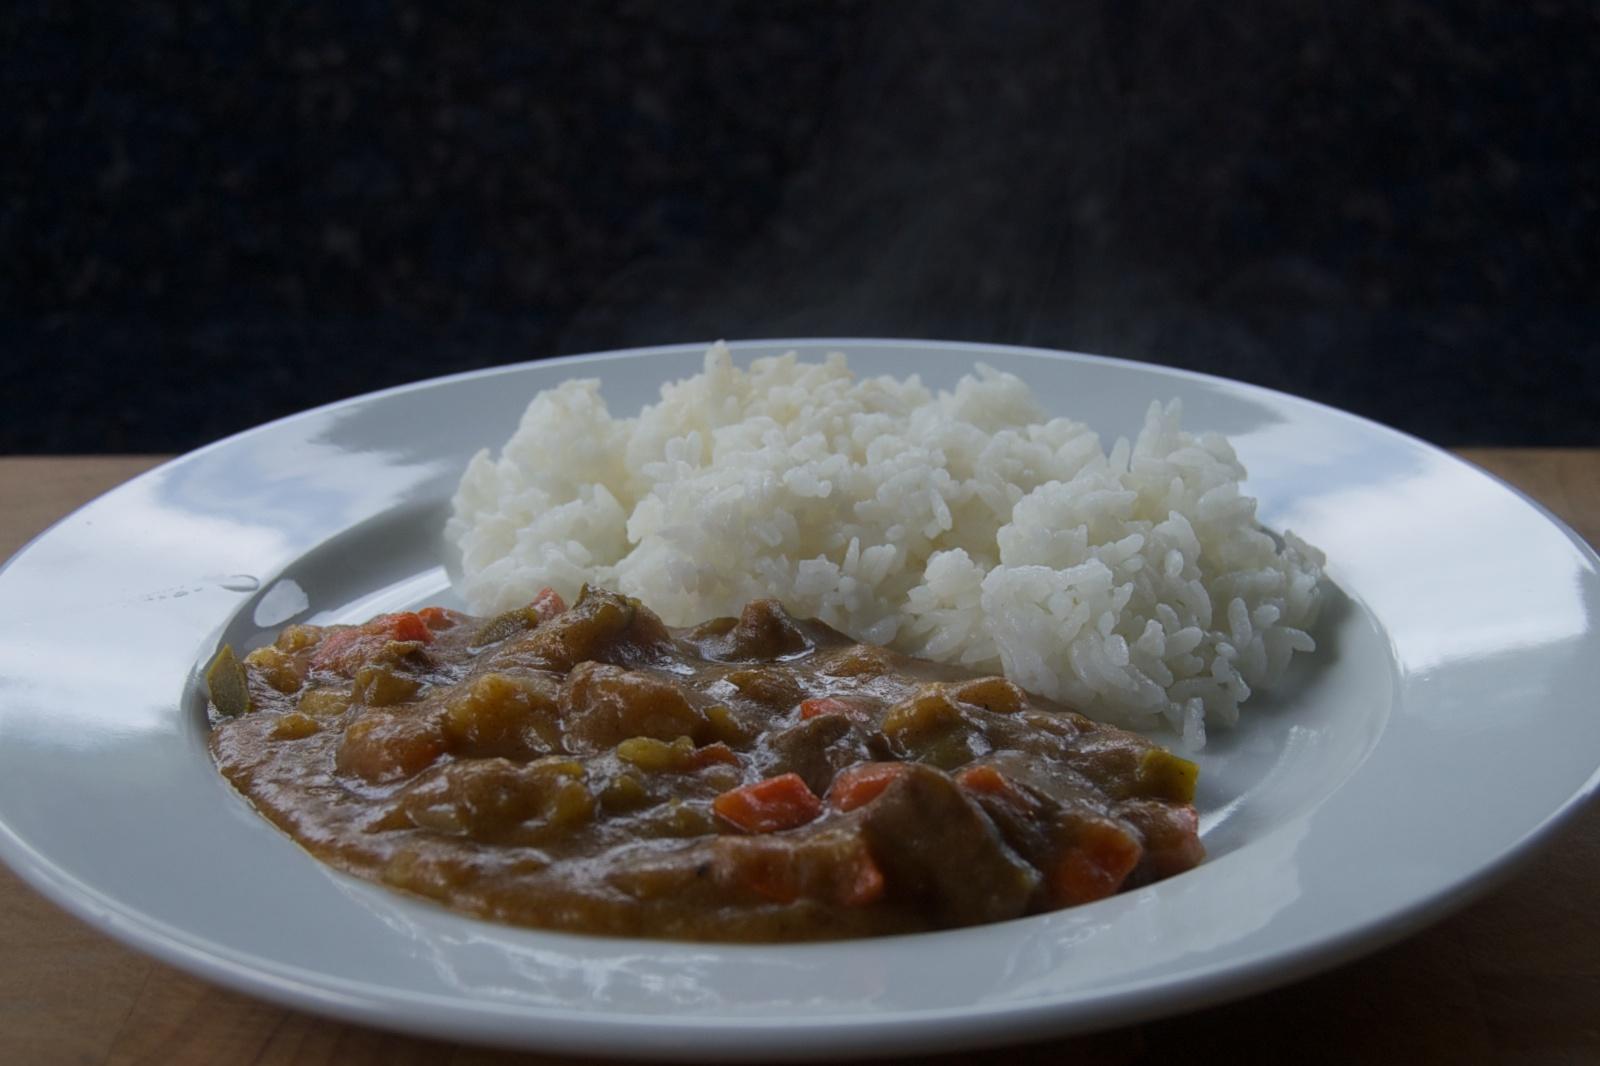 http://blog.rickk.com/food/2014/05/28/ate.2014.05.28.d.jpg